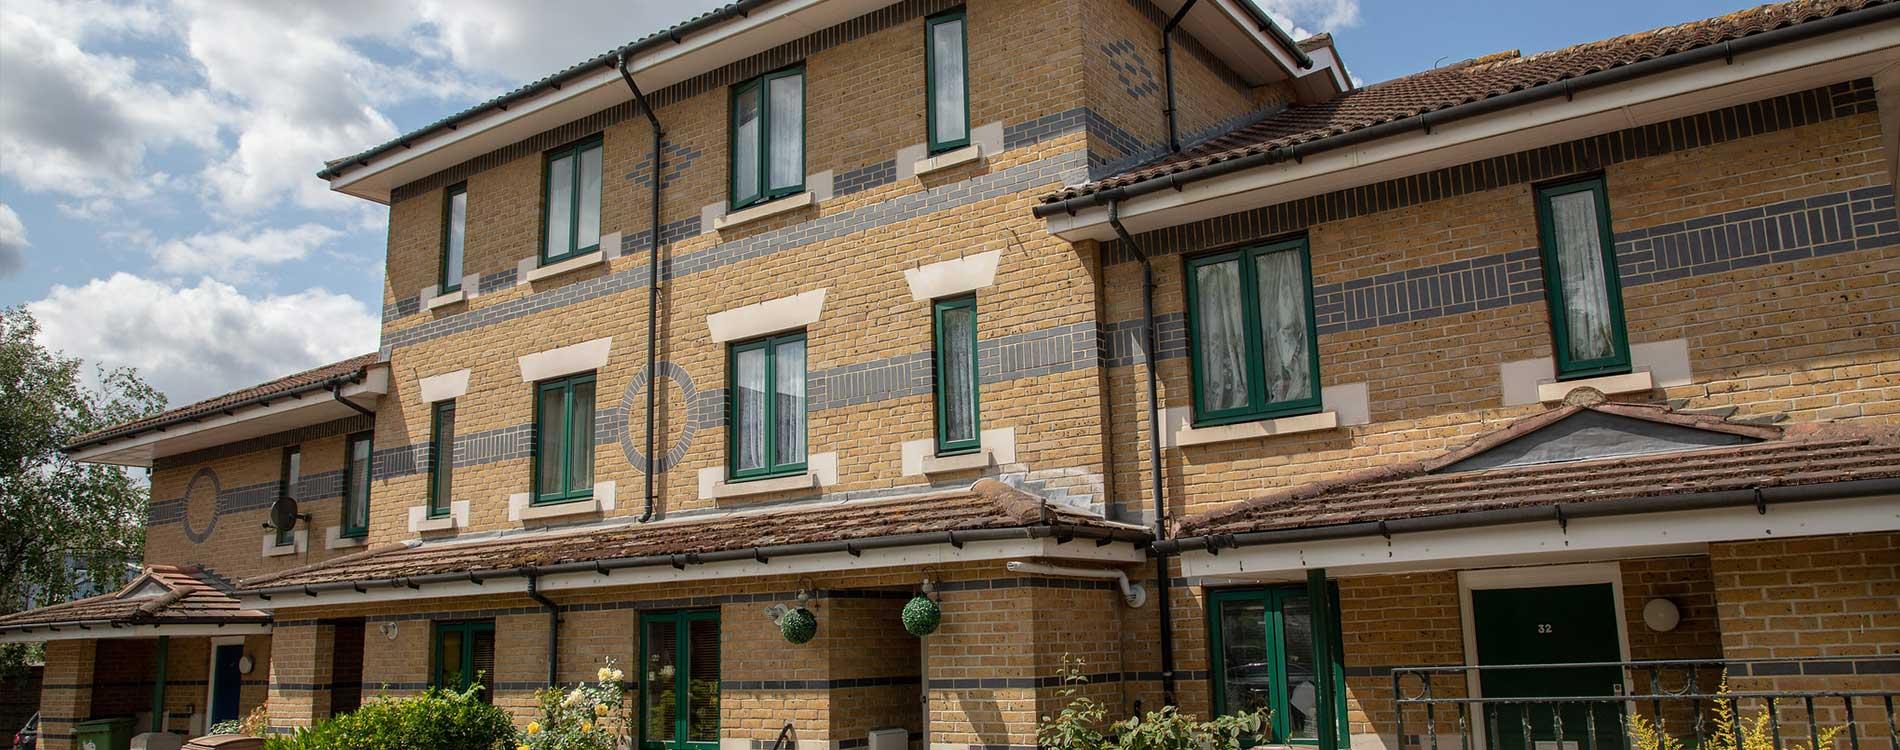 Residential estate block after external maintenance works